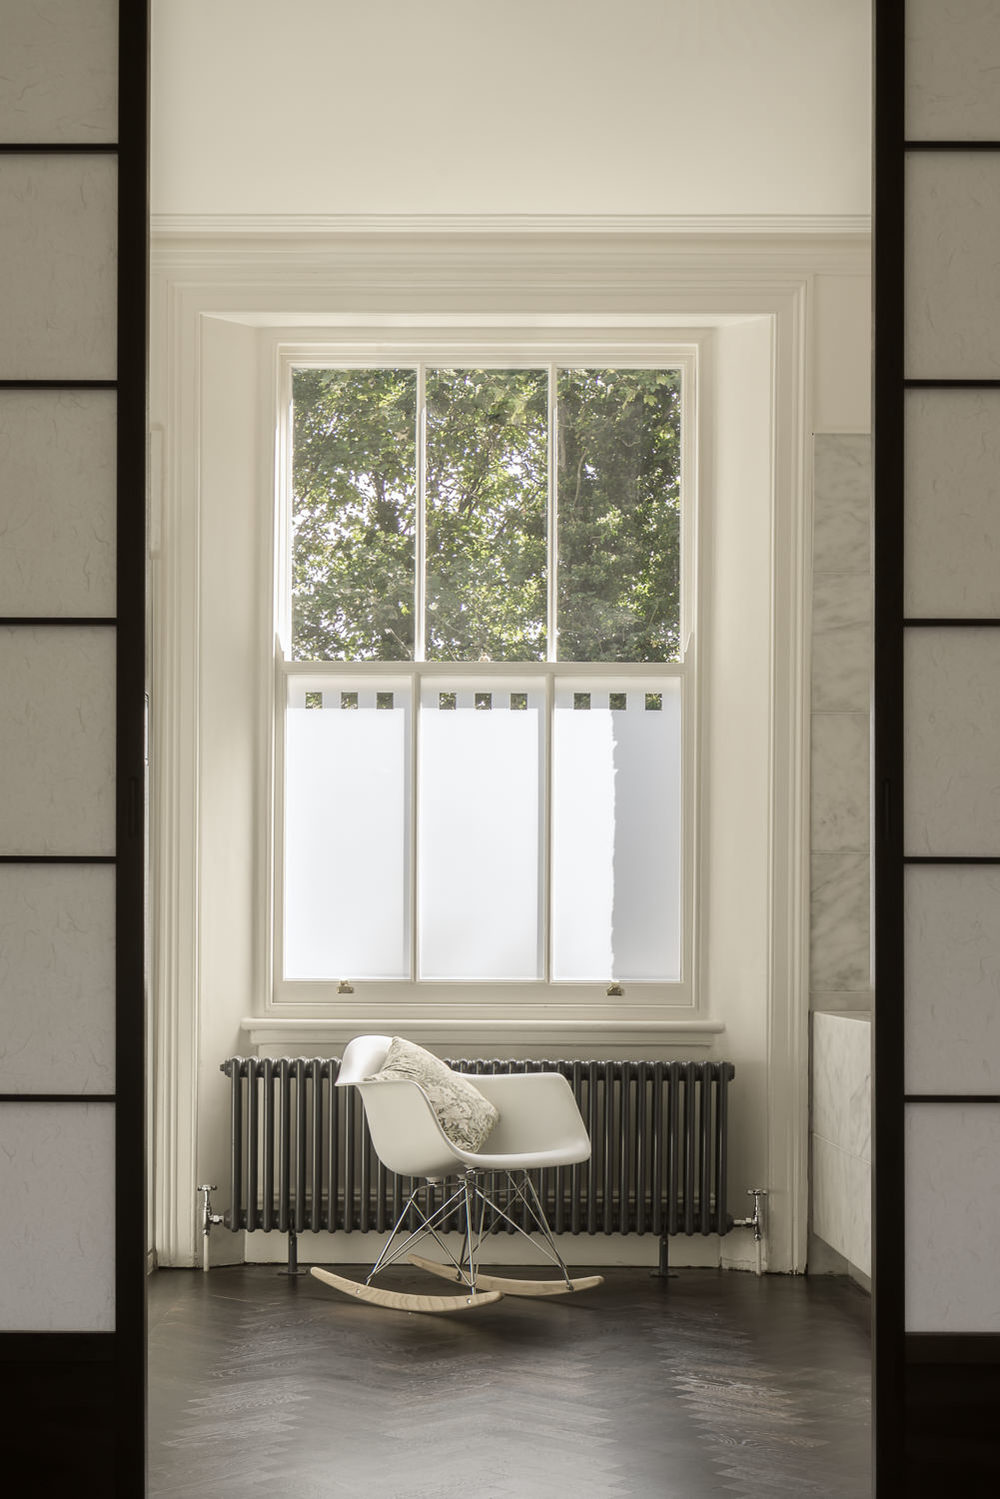 mark-hadden-architecture-photographer-architectuur-interieur-fotografie-london-amsterdam-nimtim-080-Edit.jpg